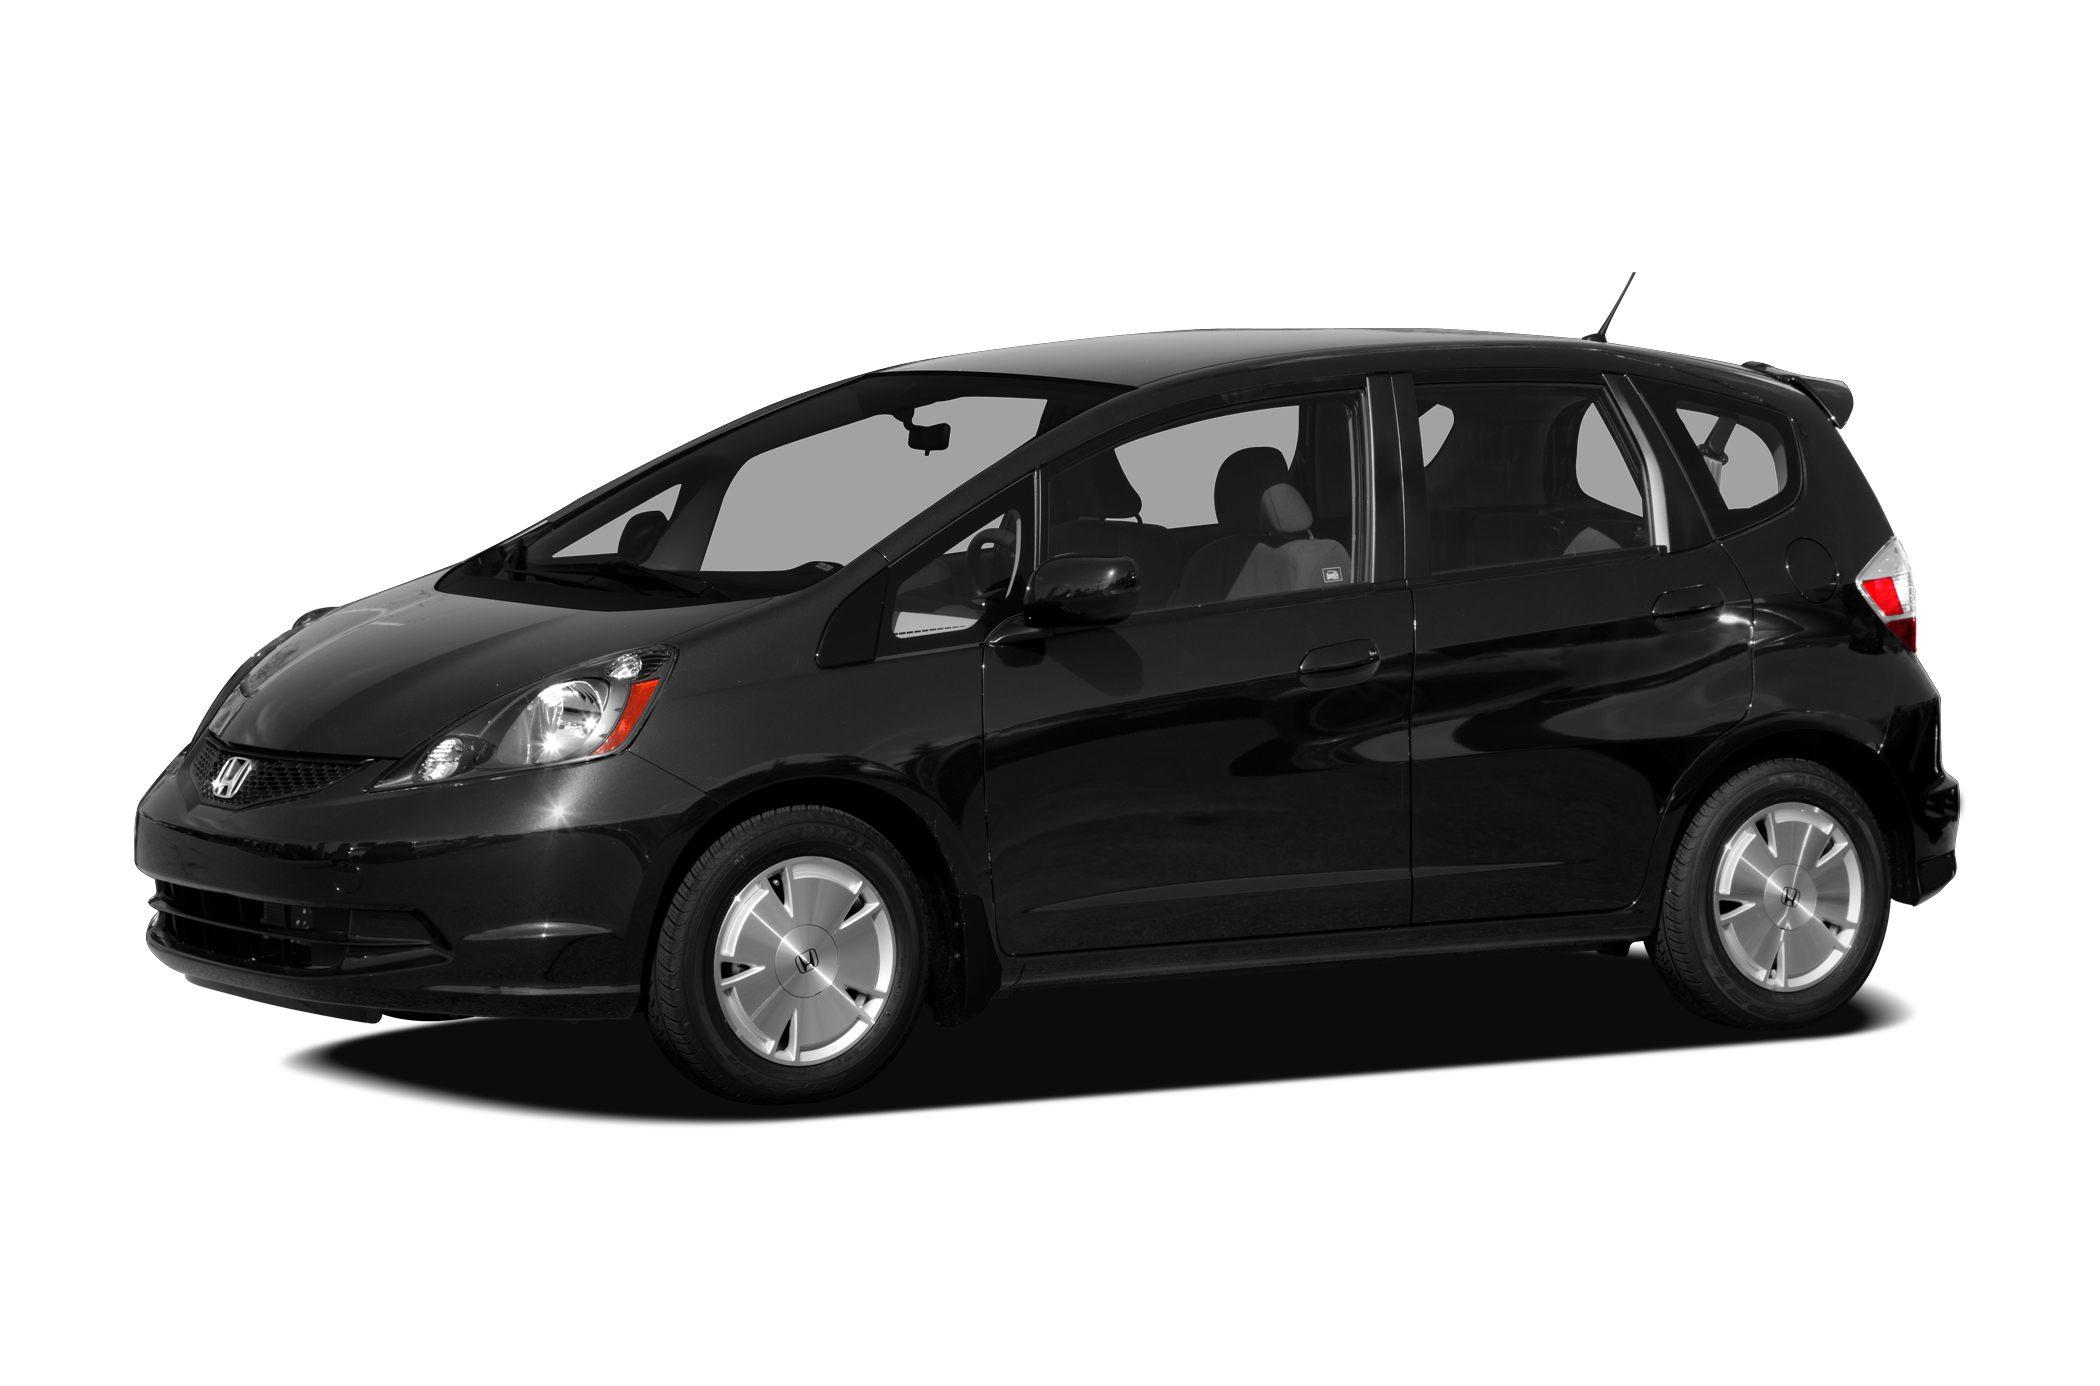 2011 Honda Fit Base Hatchback for sale in Sterling for $13,599 with 55,298 miles.